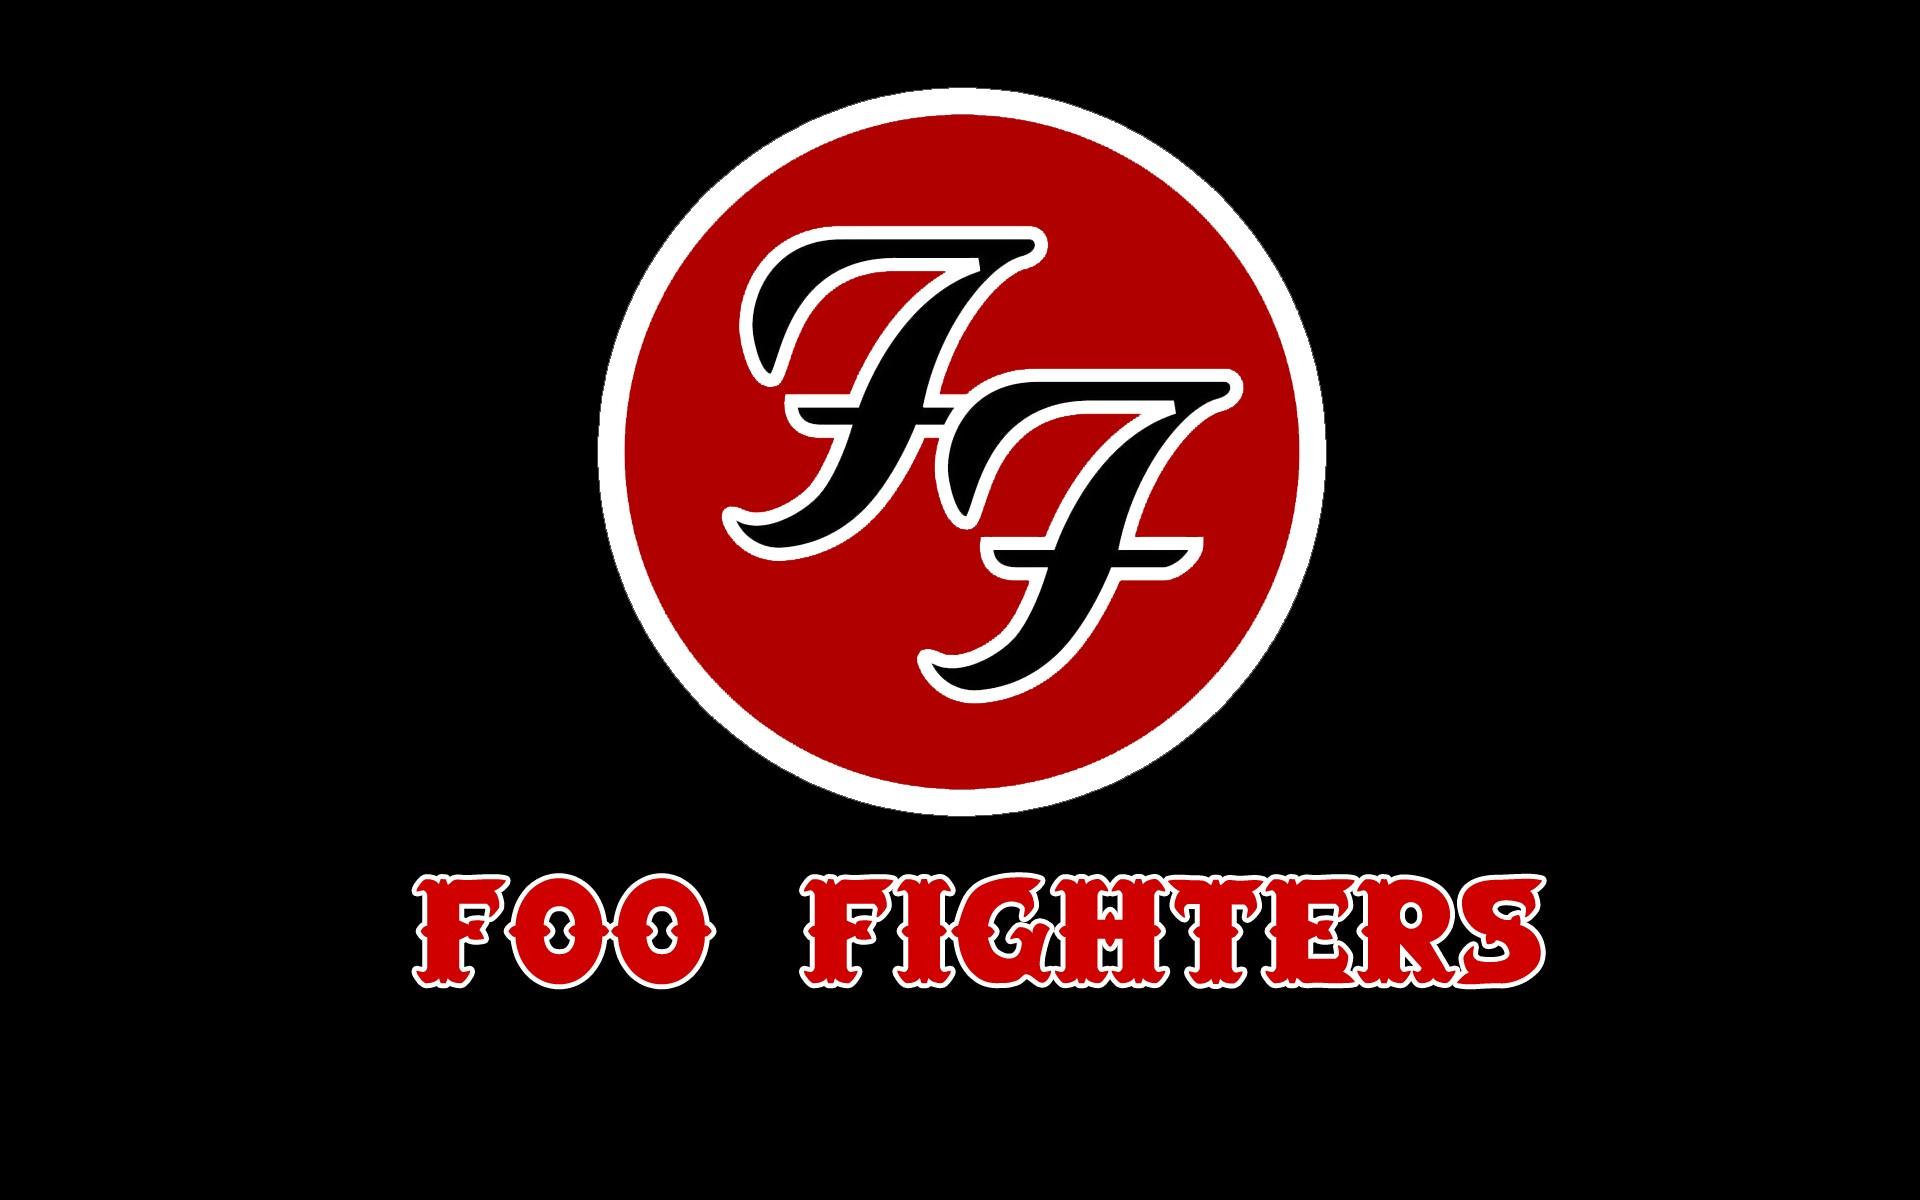 Foo Fighters Wallpaper 1920x1200 Foo Fighters 1920x1200